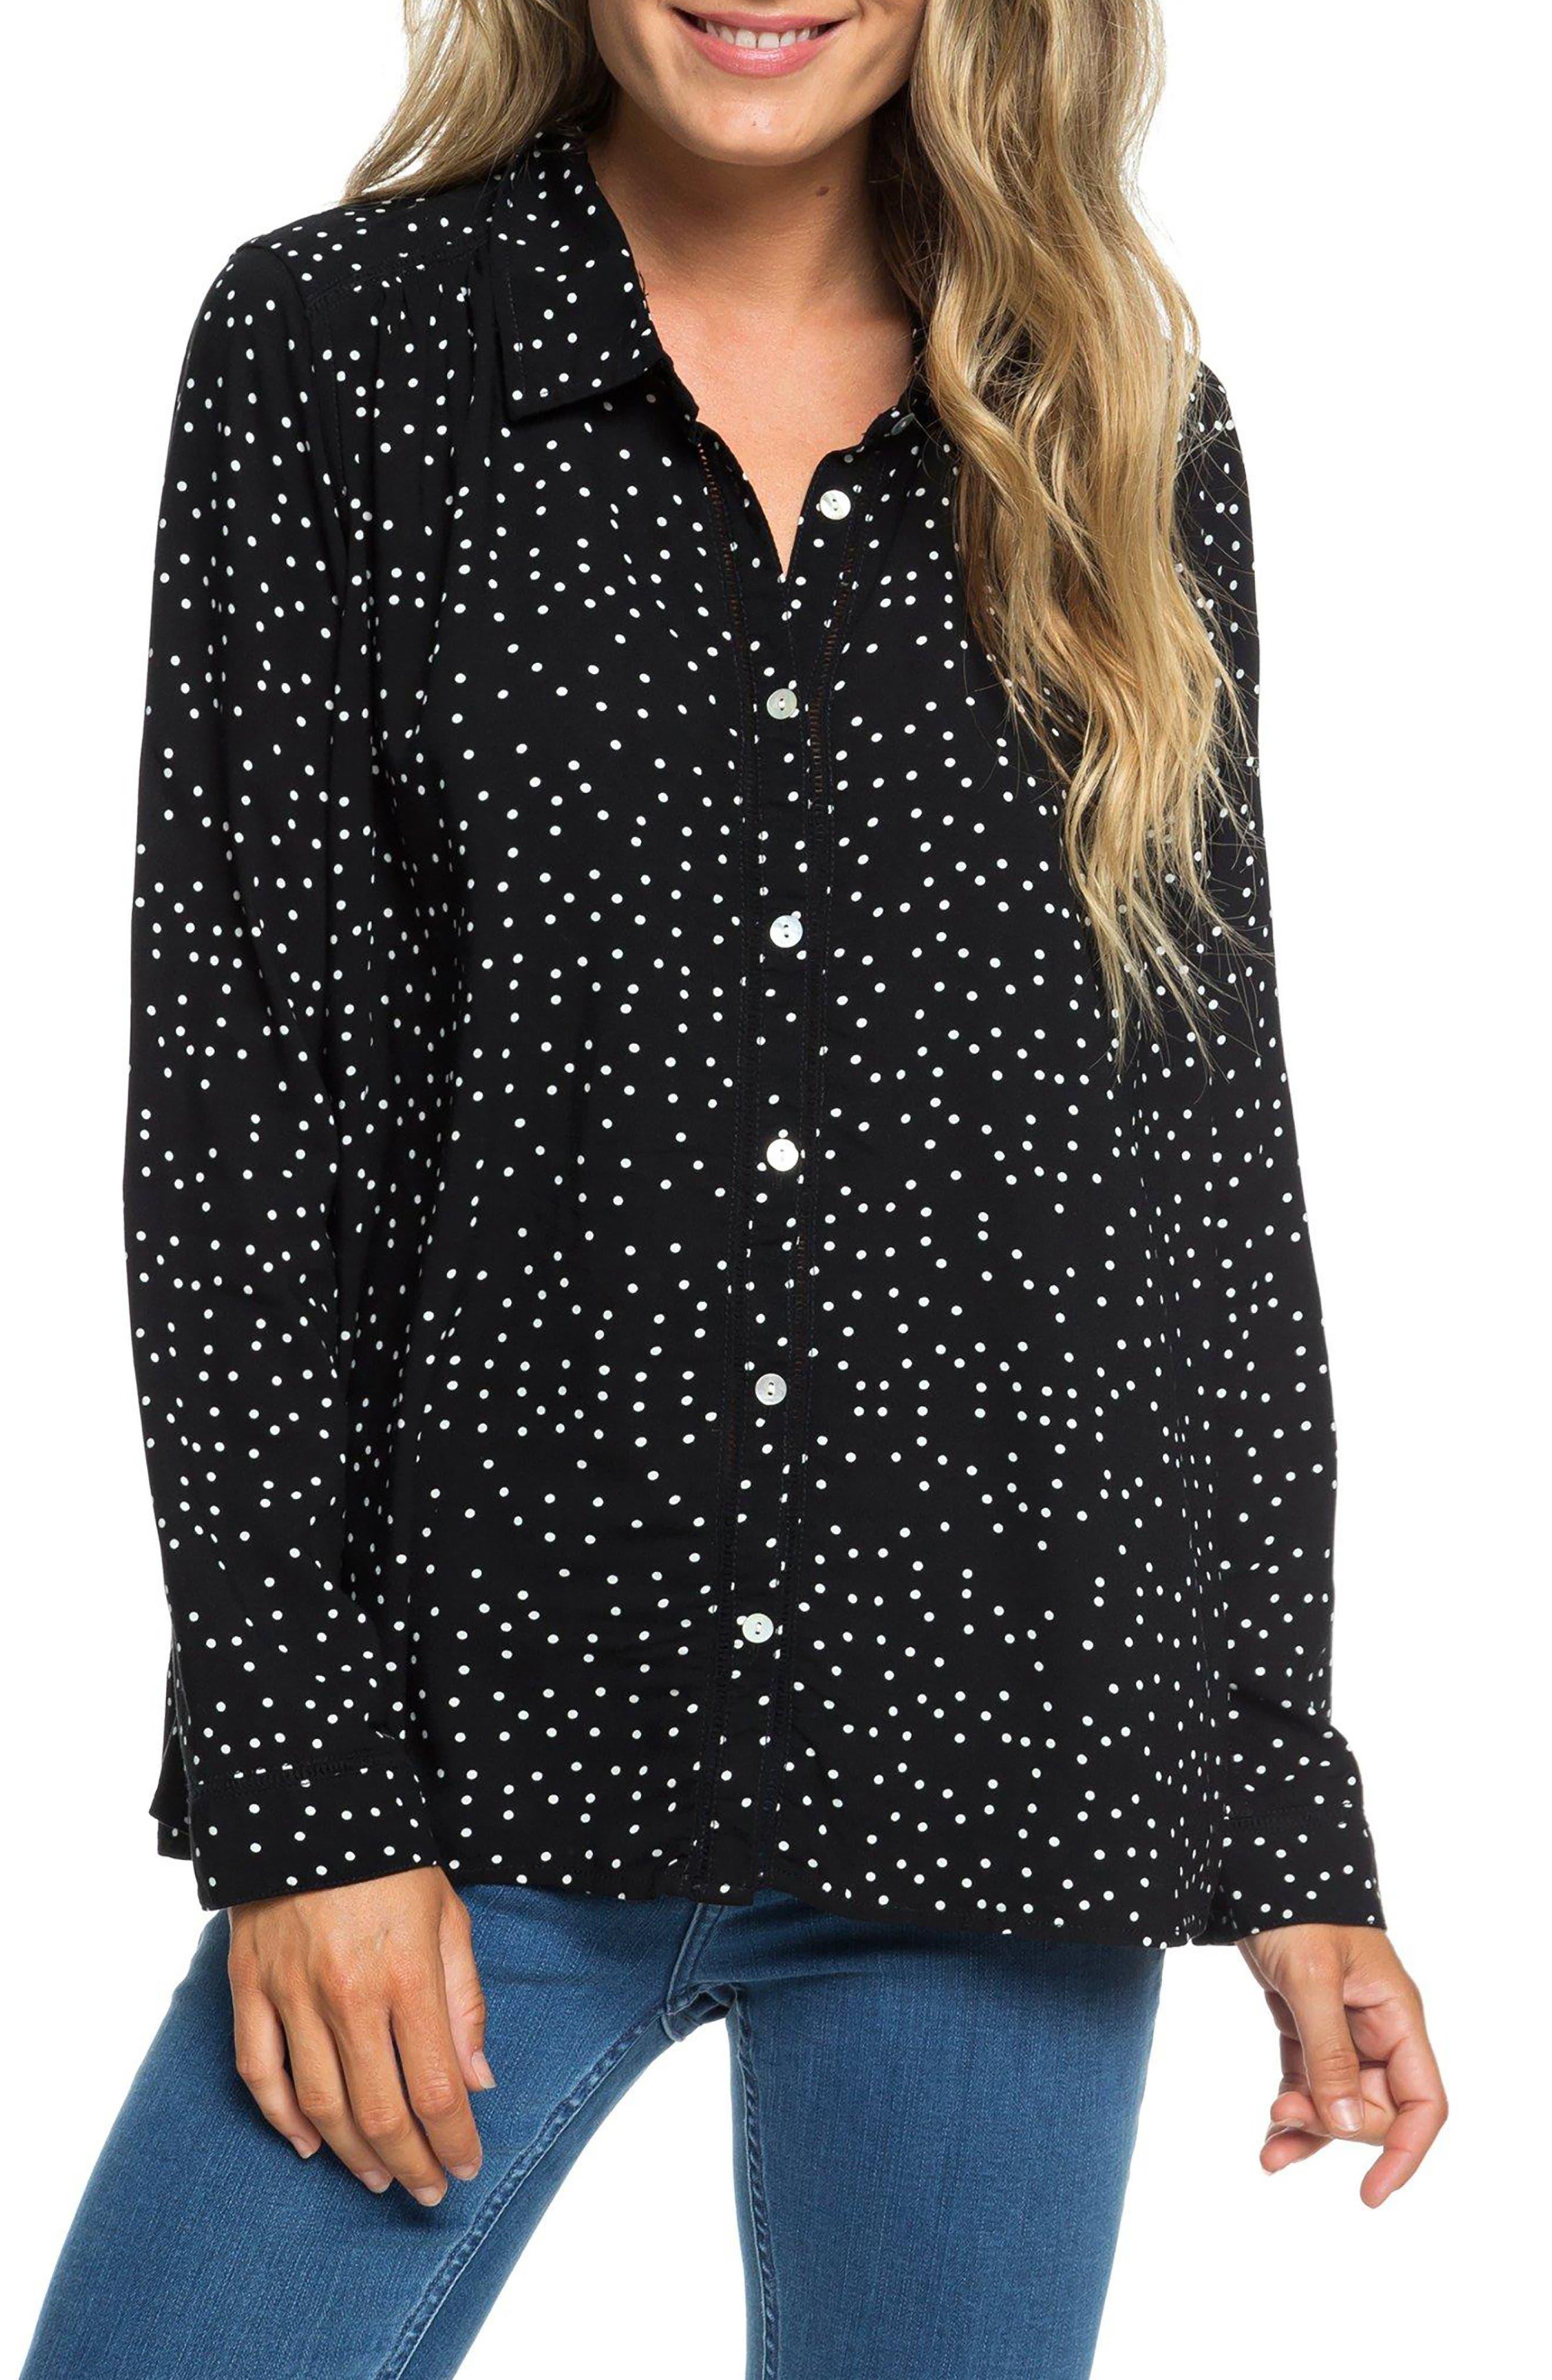 Urban Earth Polka Dot Shirt,                         Main,                         color, TRUE BLACK DOTS FOR DAYS